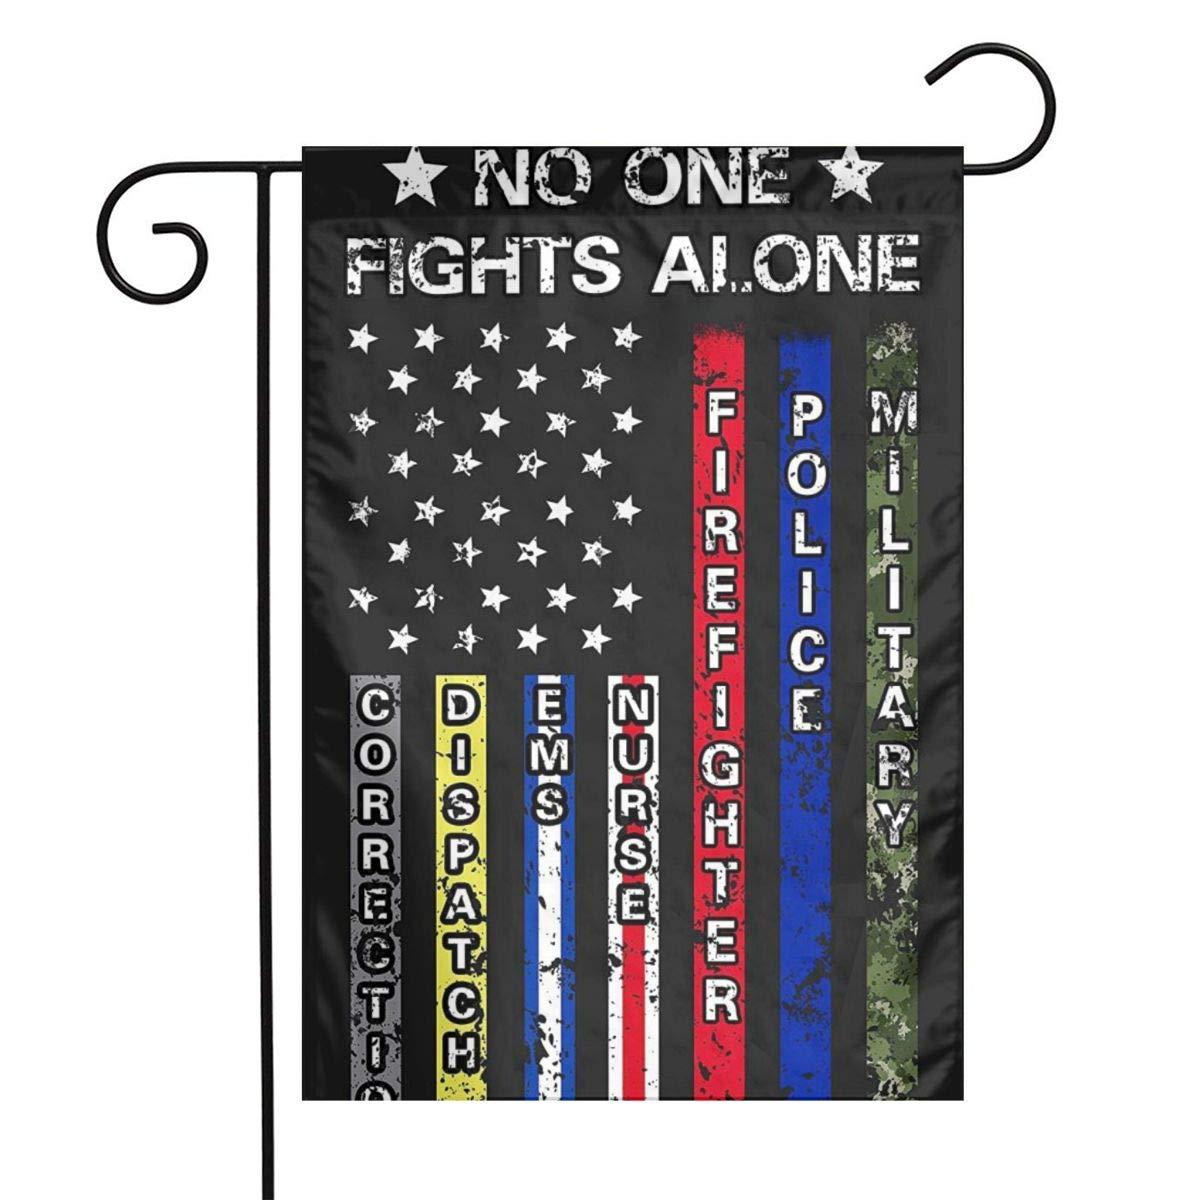 UKFfLlUiKpOdiXojeser No One Fights Alone US Garden Flag, Perfect Decor for Outdoor Yard Porch Patio Farmhouse Lawn, 12 X 18 Inch